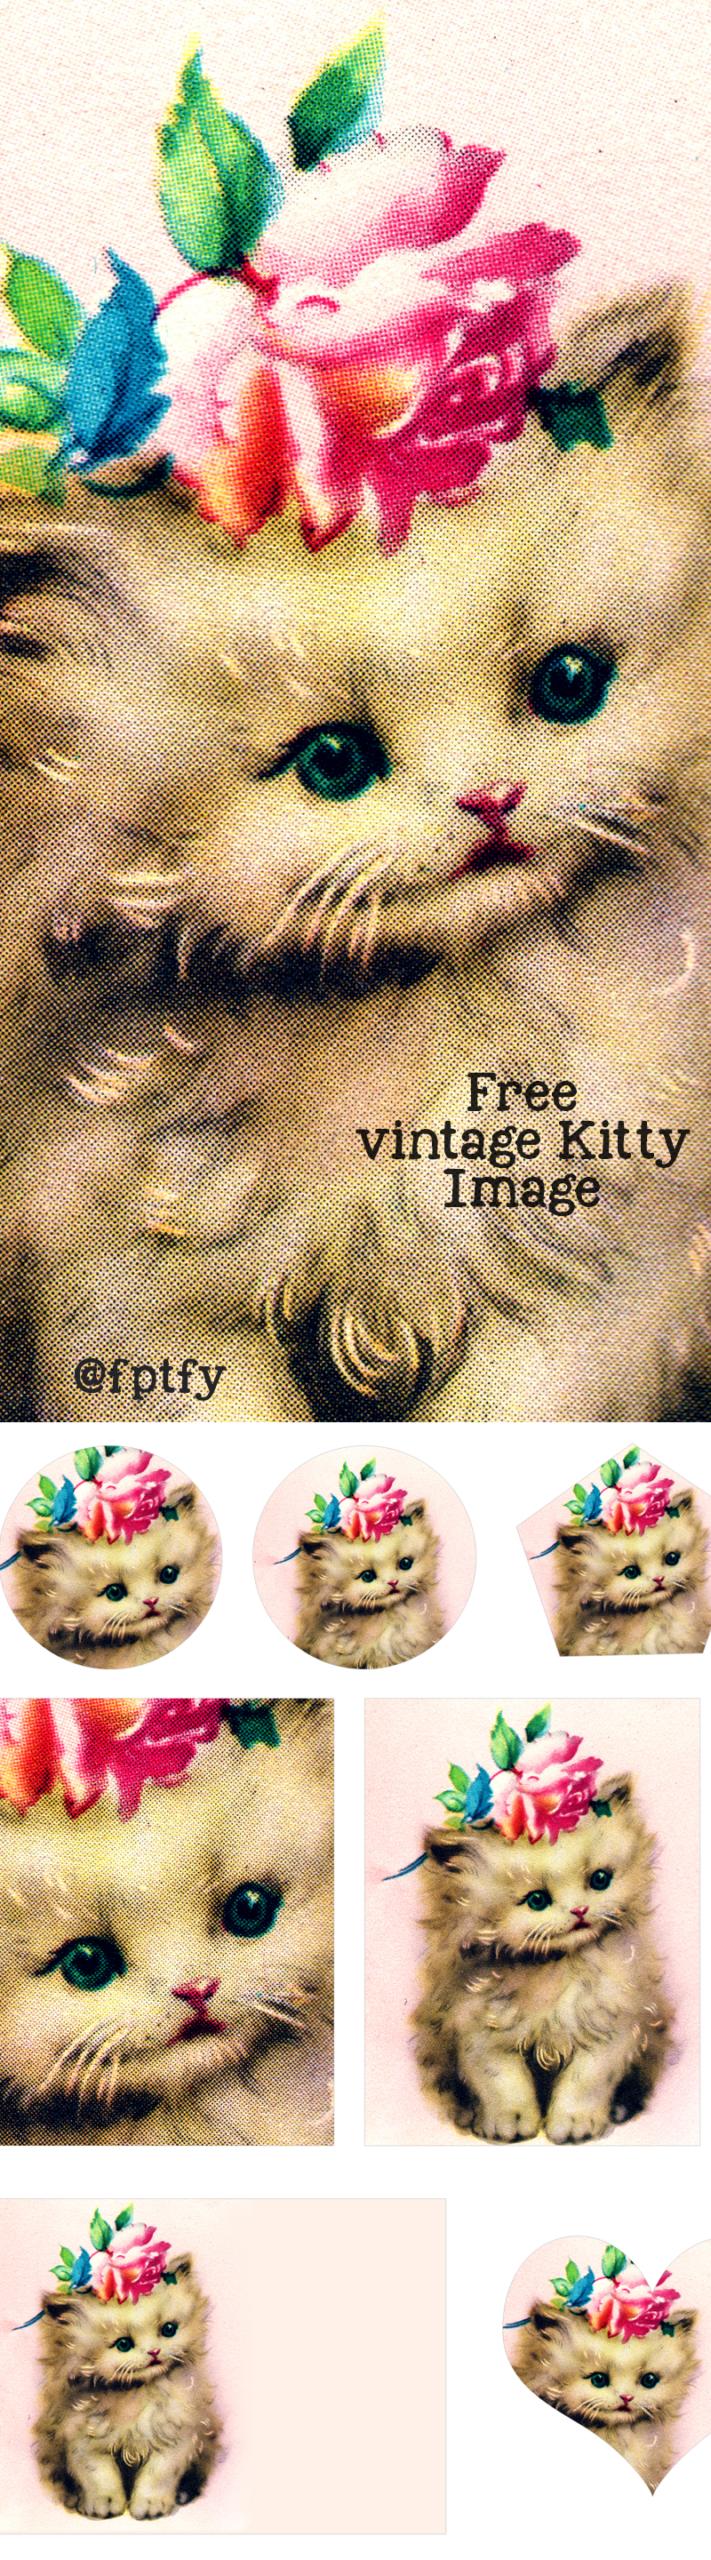 Free Vintage Kitty Cat Image + Collage Sheet